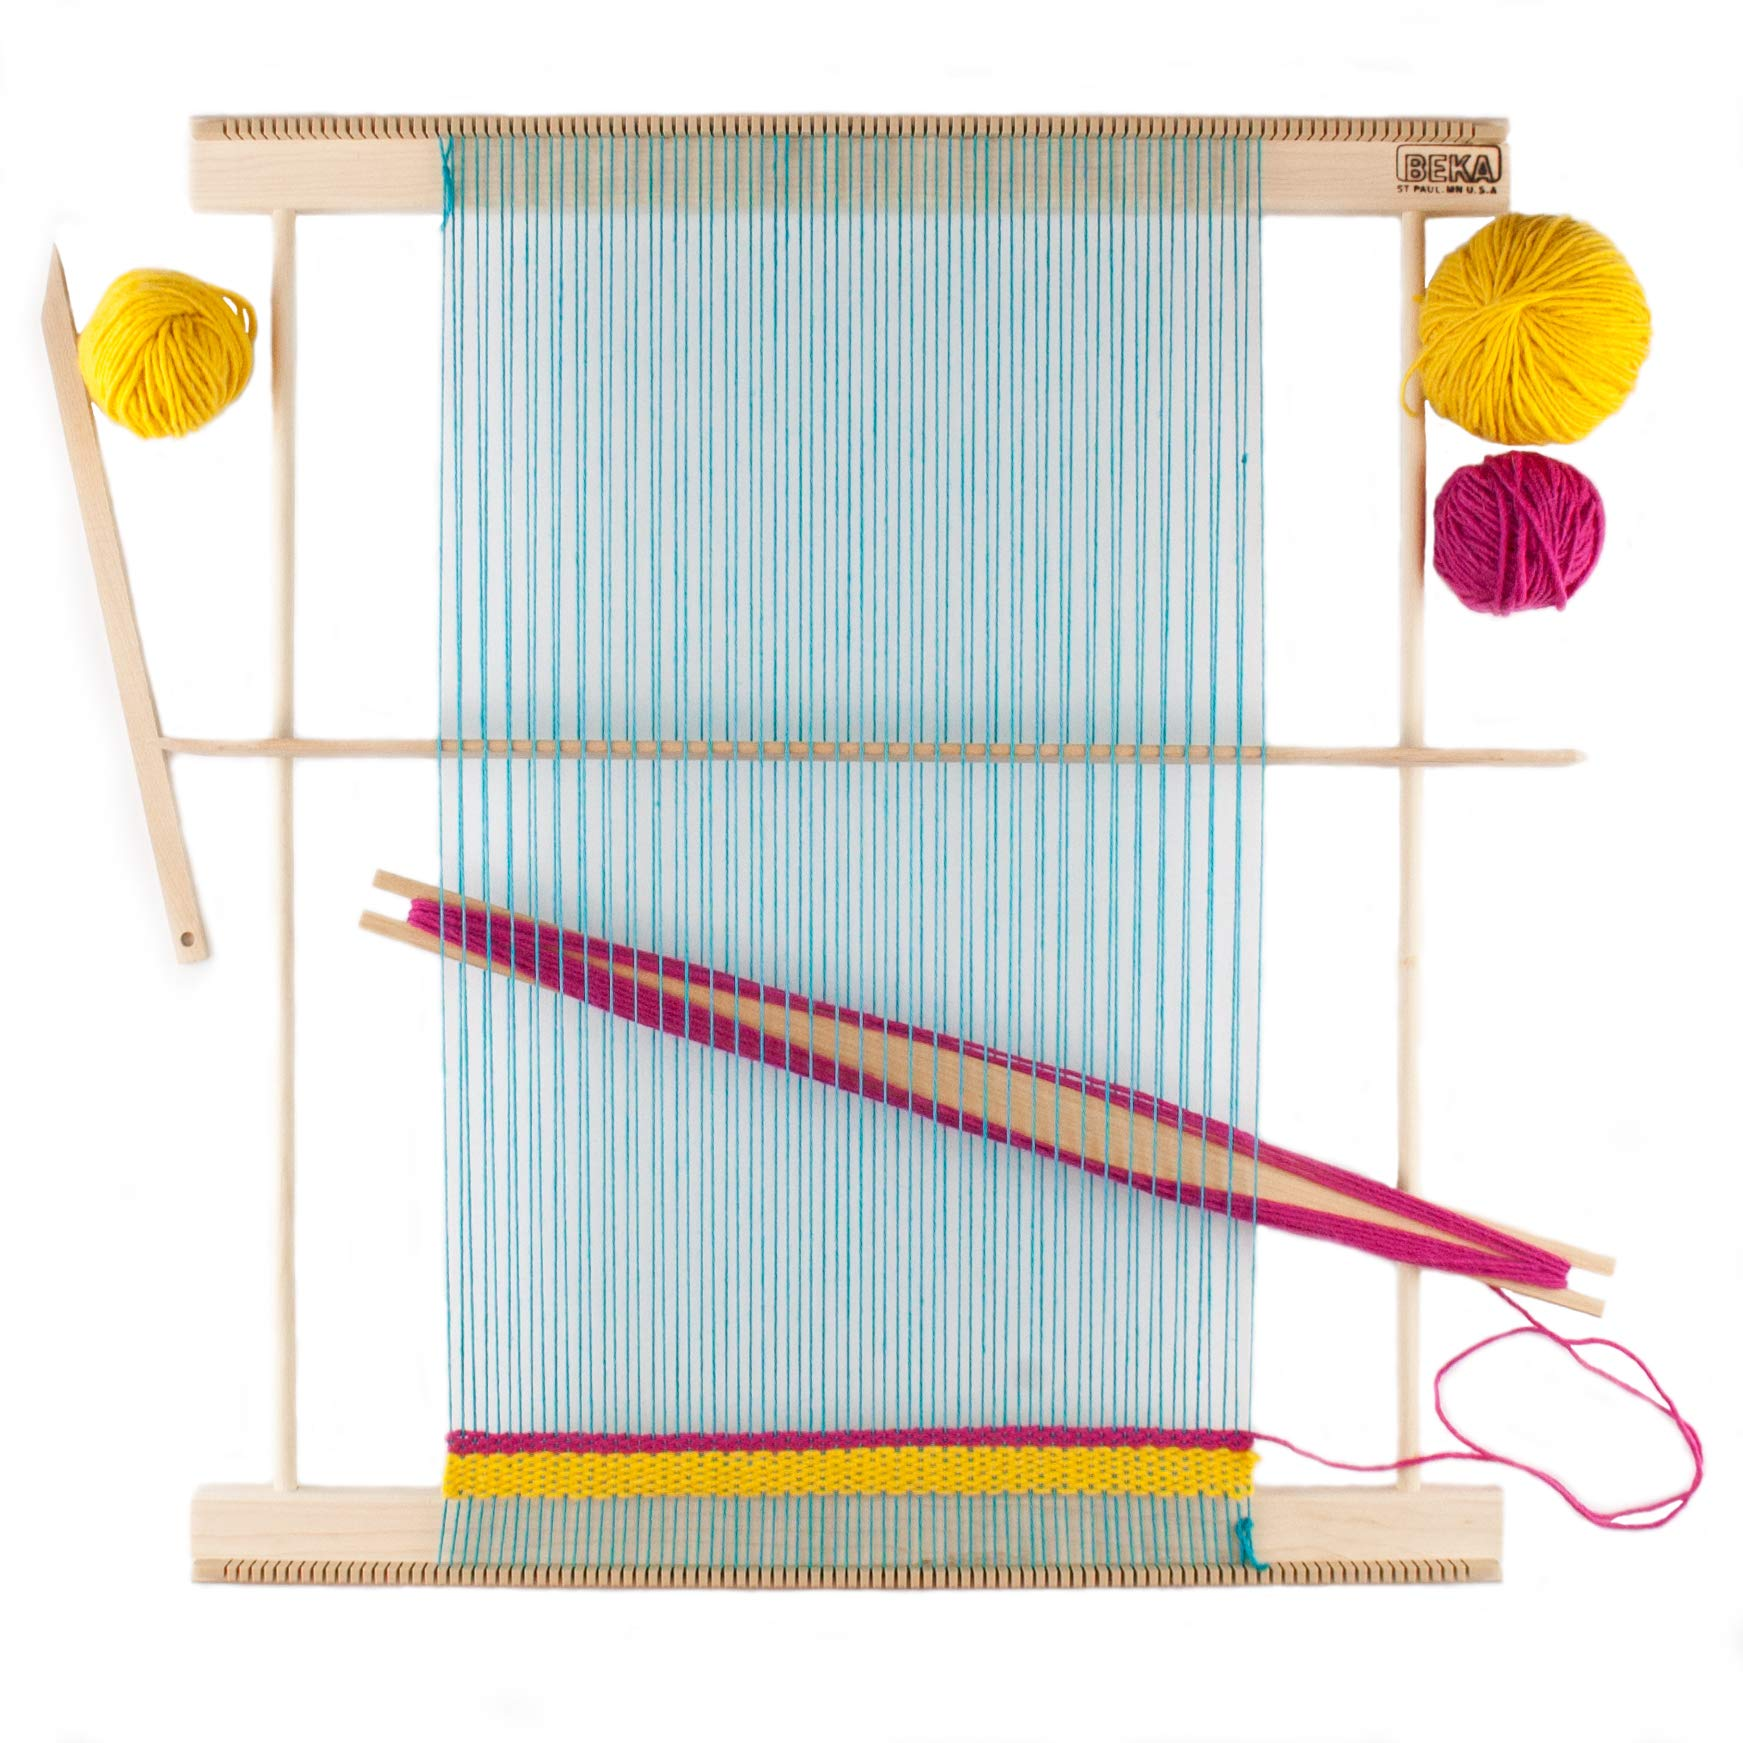 Beka 20'' Weaving Frame by Beka